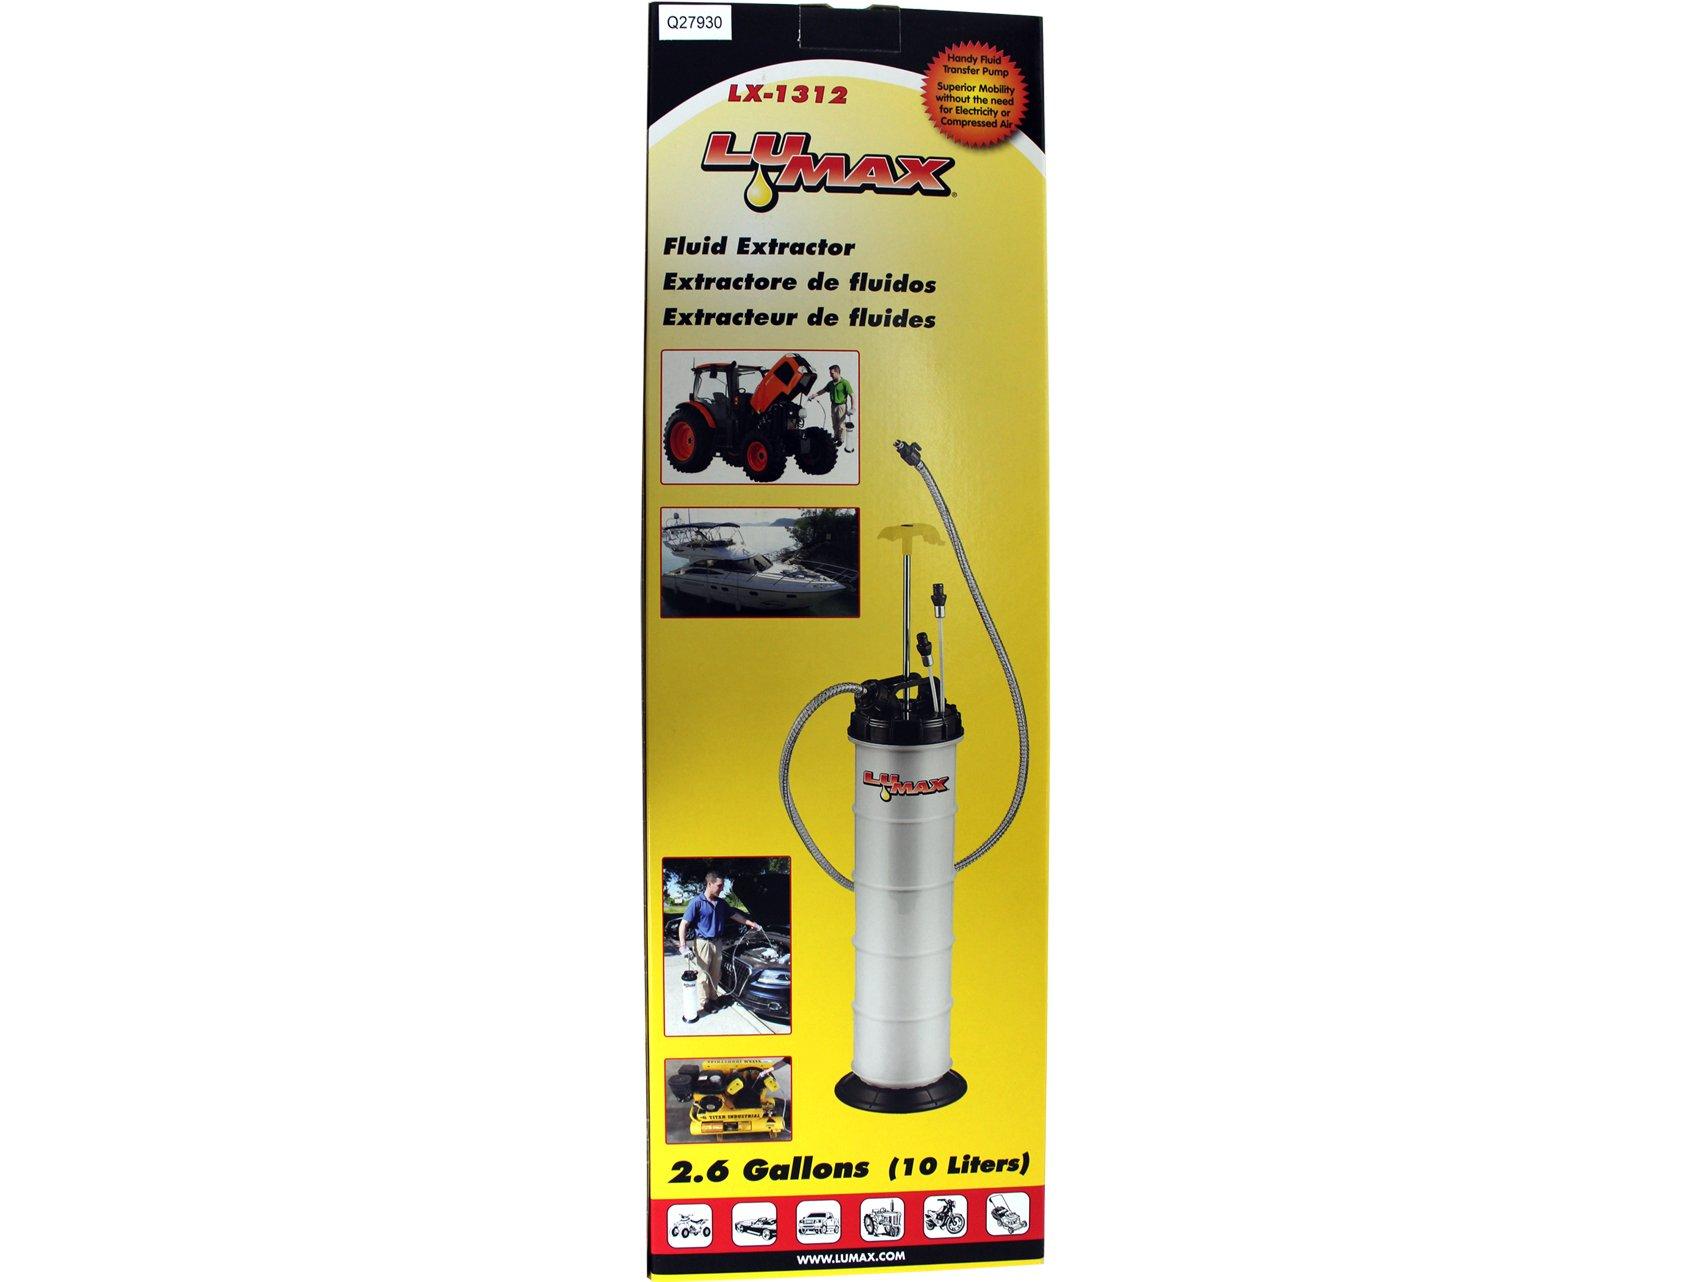 Lumax LX-1312 Manual Fluid Extractor, 2.6G (10L) Capacity by Lumax (Image #2)